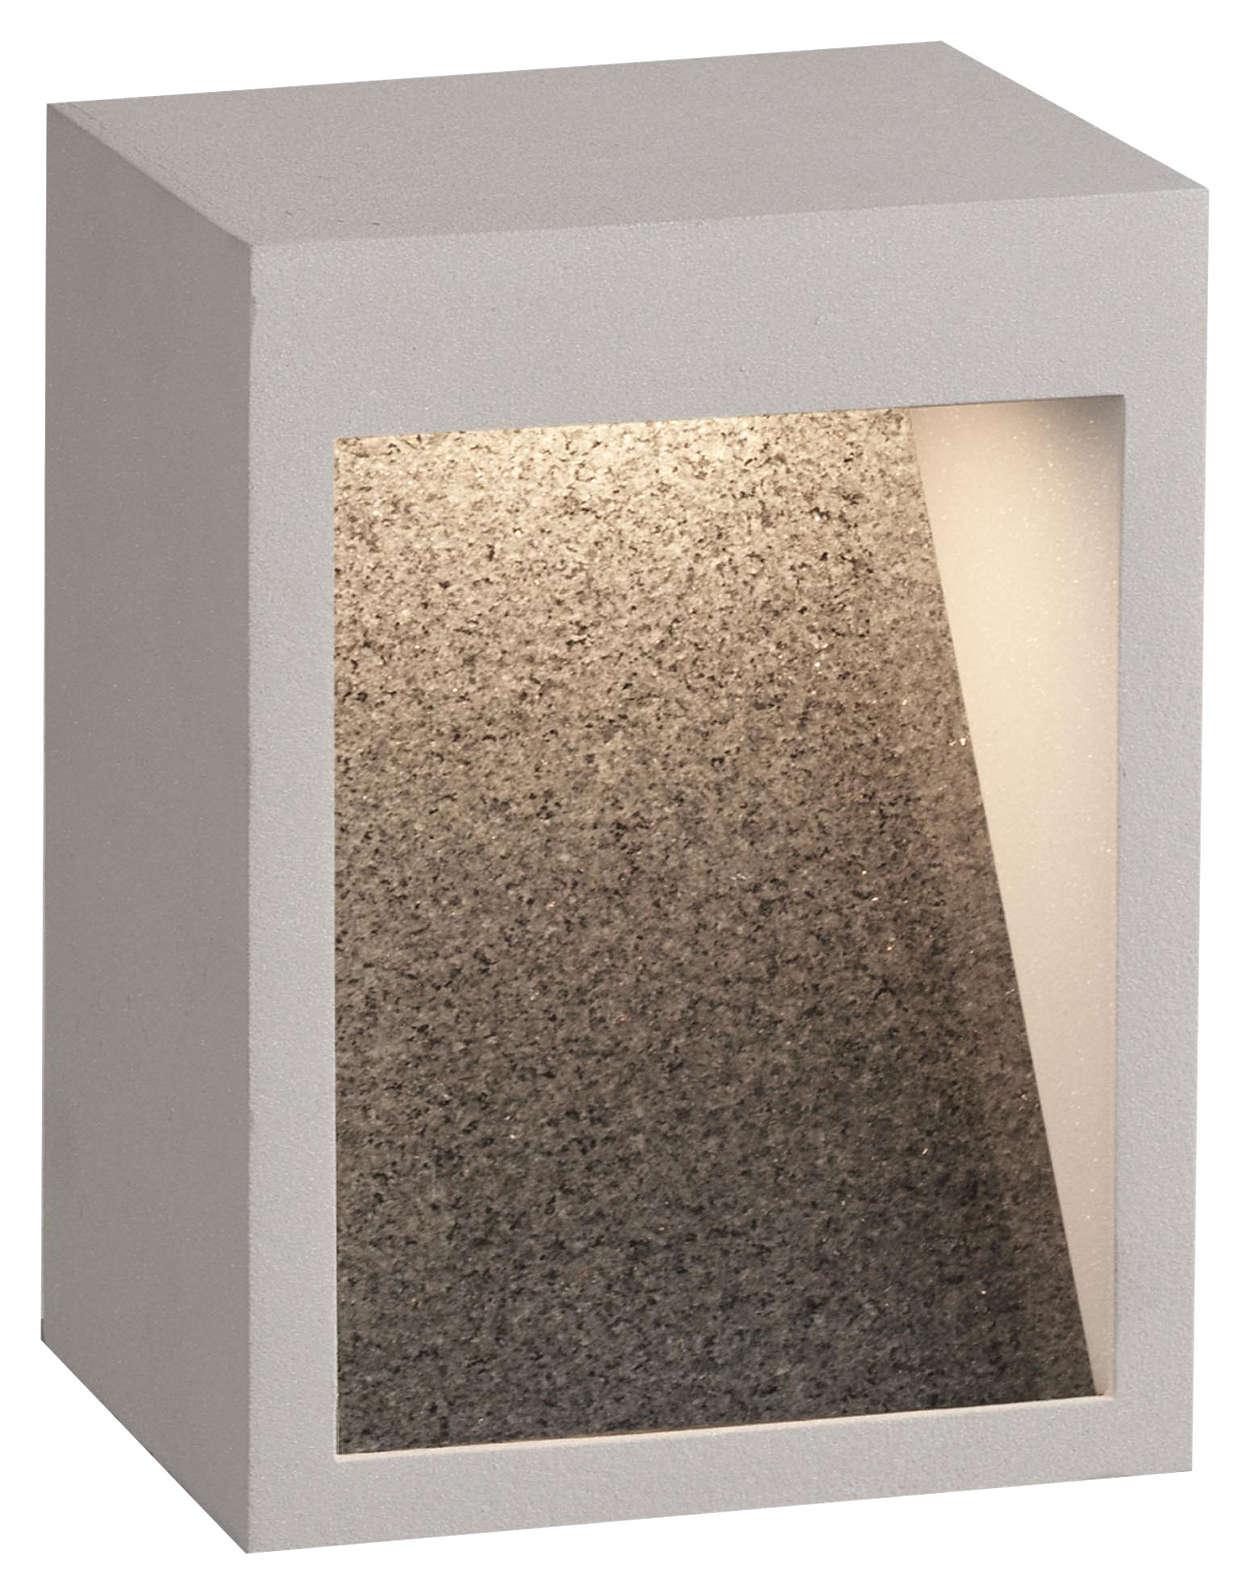 Moonbeam 1-light LED Wall in Graphite finish